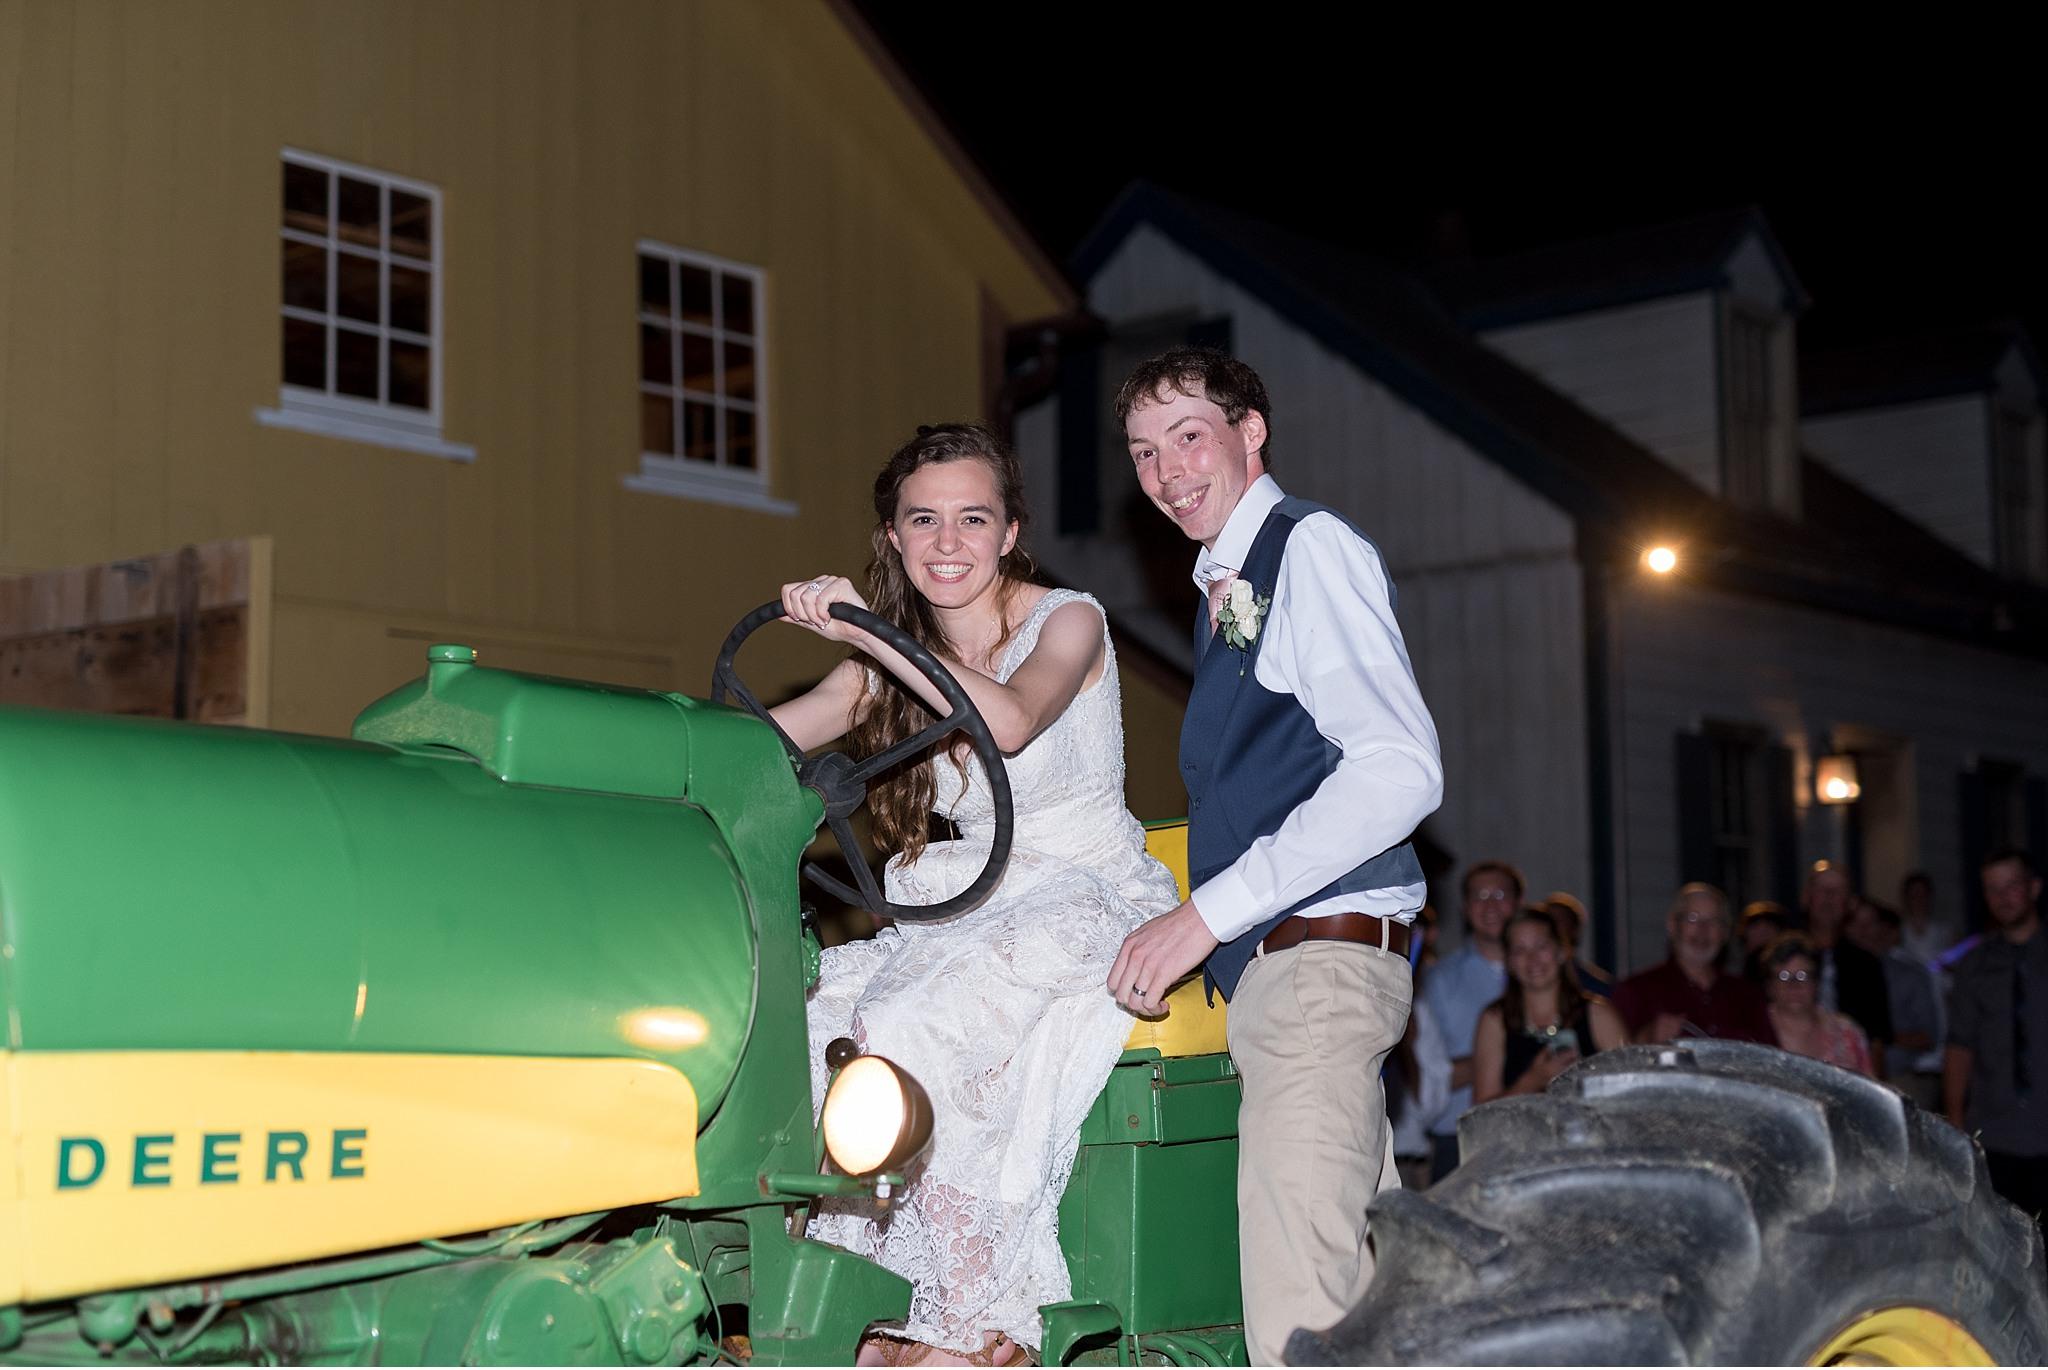 Romantic Summer wedding Landis Valley Museum Lancaster PA wedding photography John Deere Tractor_1999.jpg